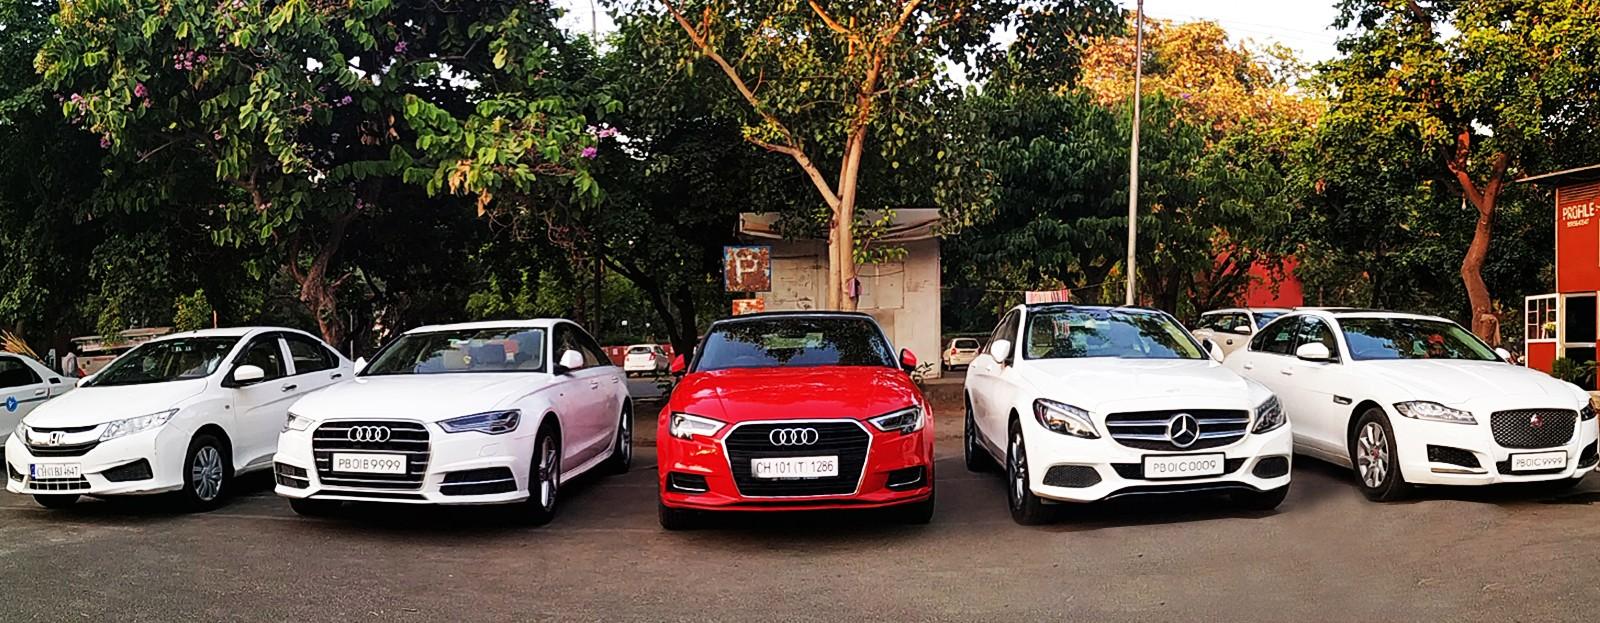 Luxury rental fleet in Chandigarh and Best Luxury cars company in Chandigarh, Premium cars provider in Chandigarh and luxury cab rental in Chandigarh